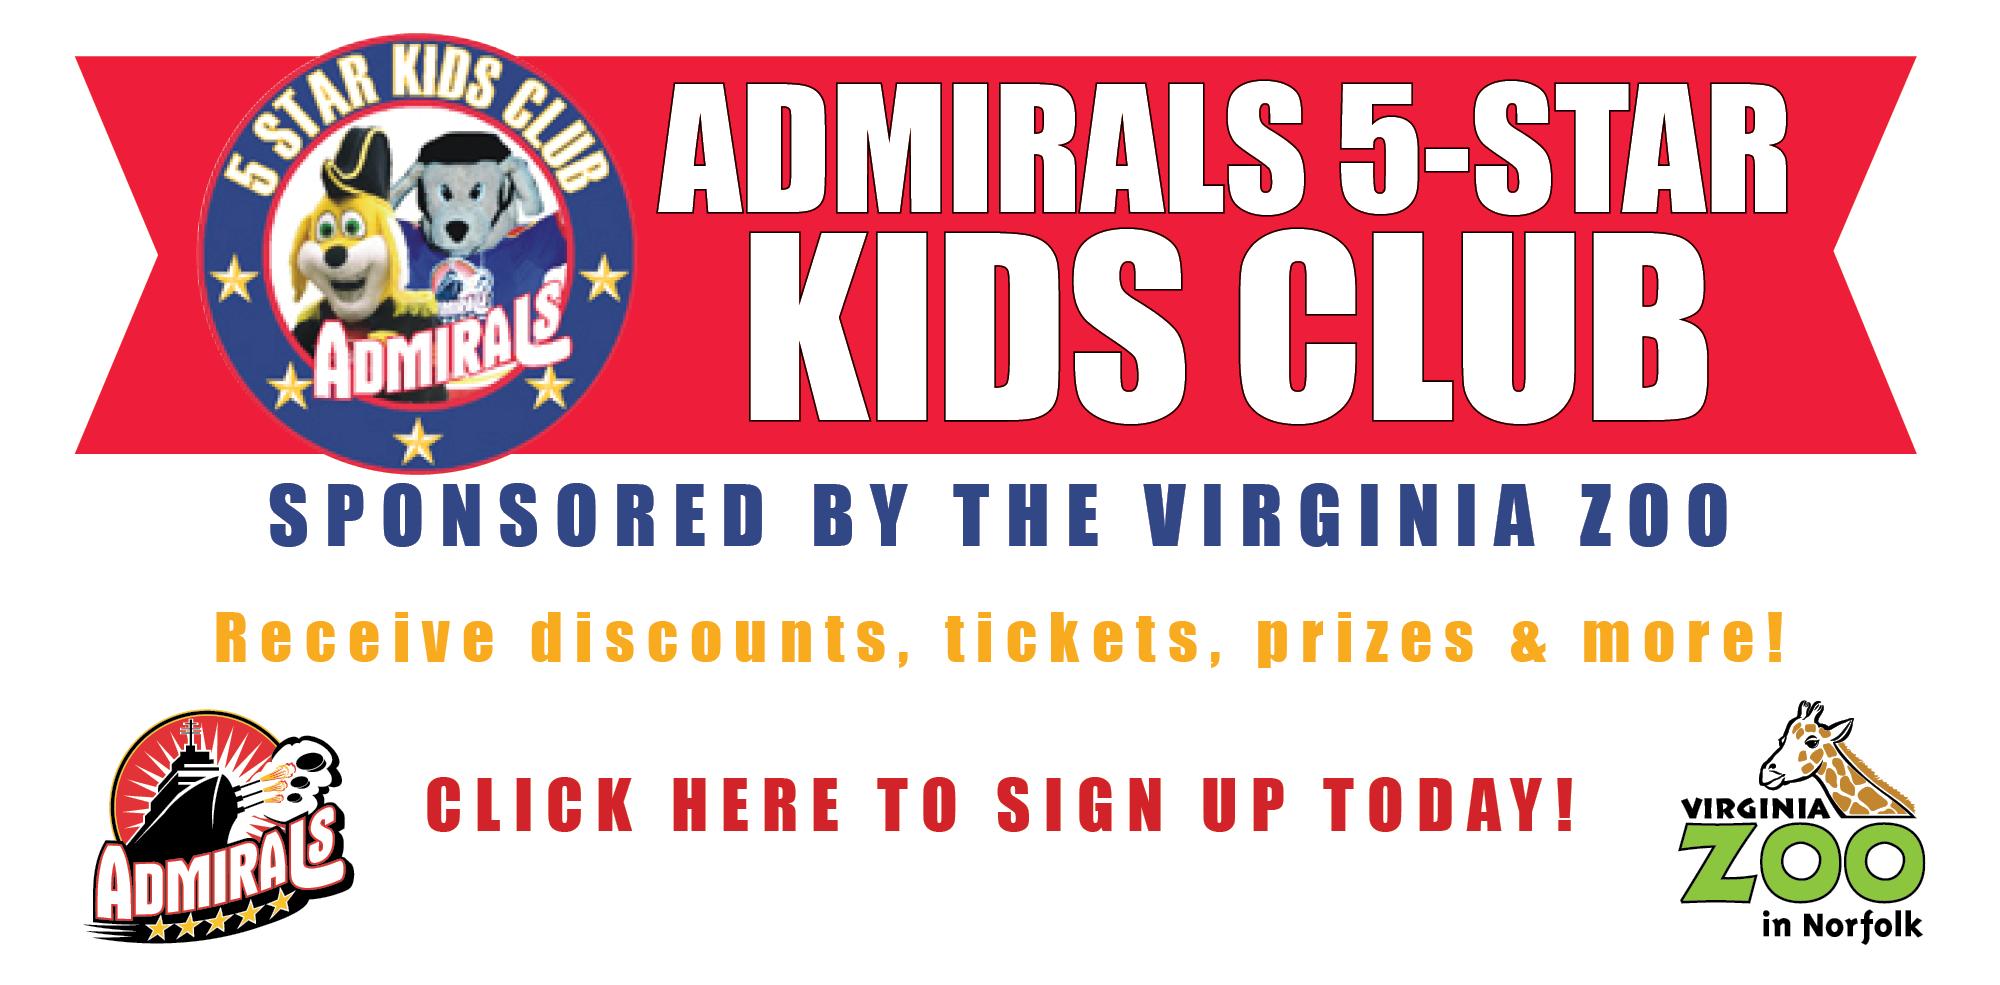 vazoo_admirals_web-banner